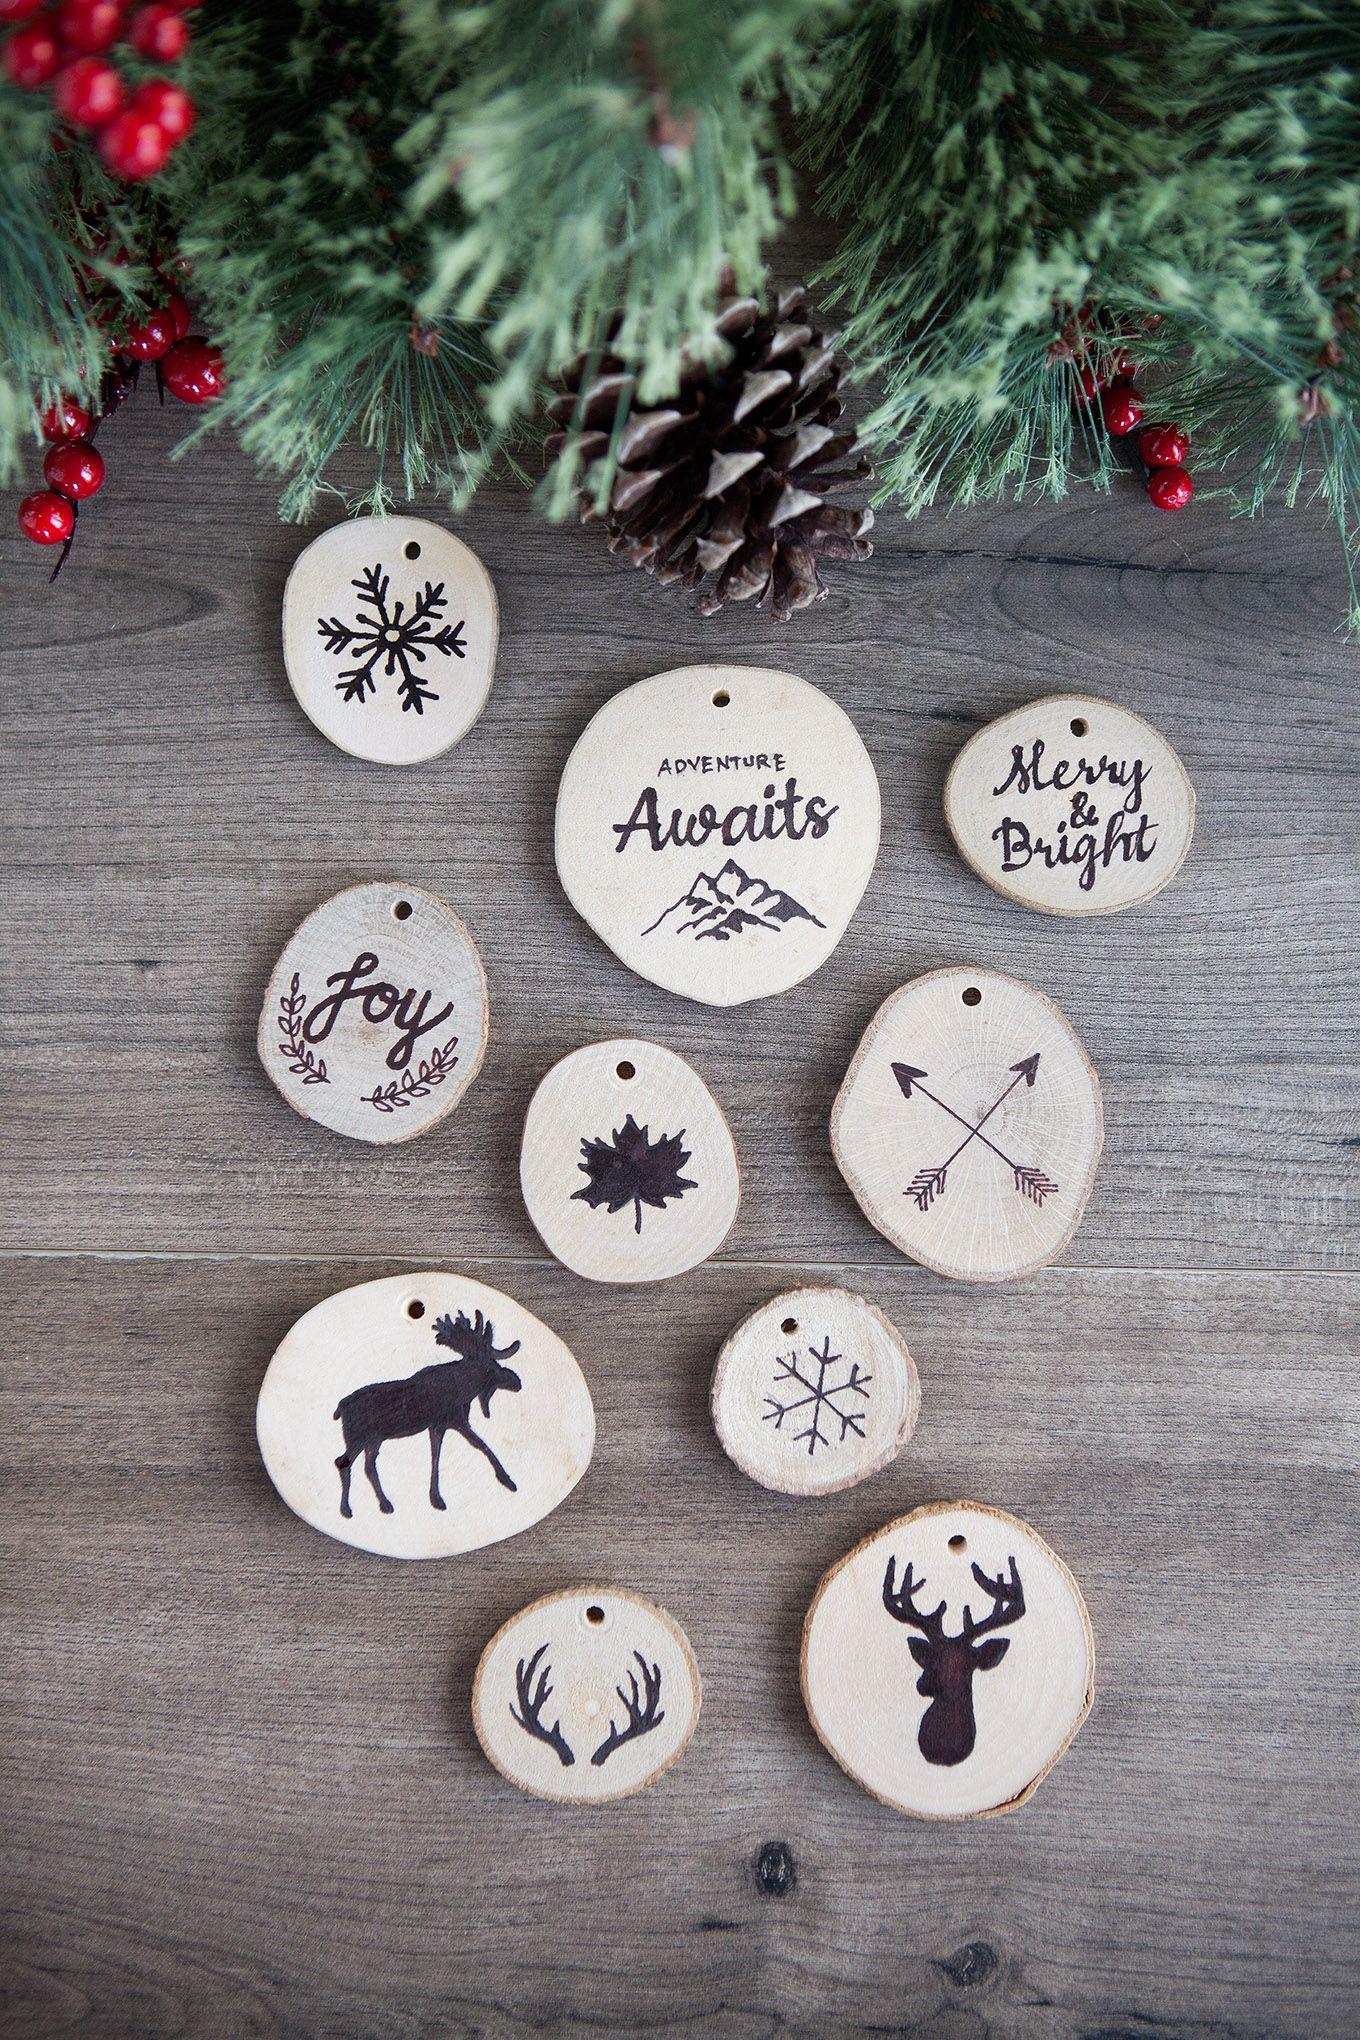 Faux Wood Burned Christmas Tree Ornaments Christmas Wood Christmas Crafts For Gifts Dyi Christmas Ornaments